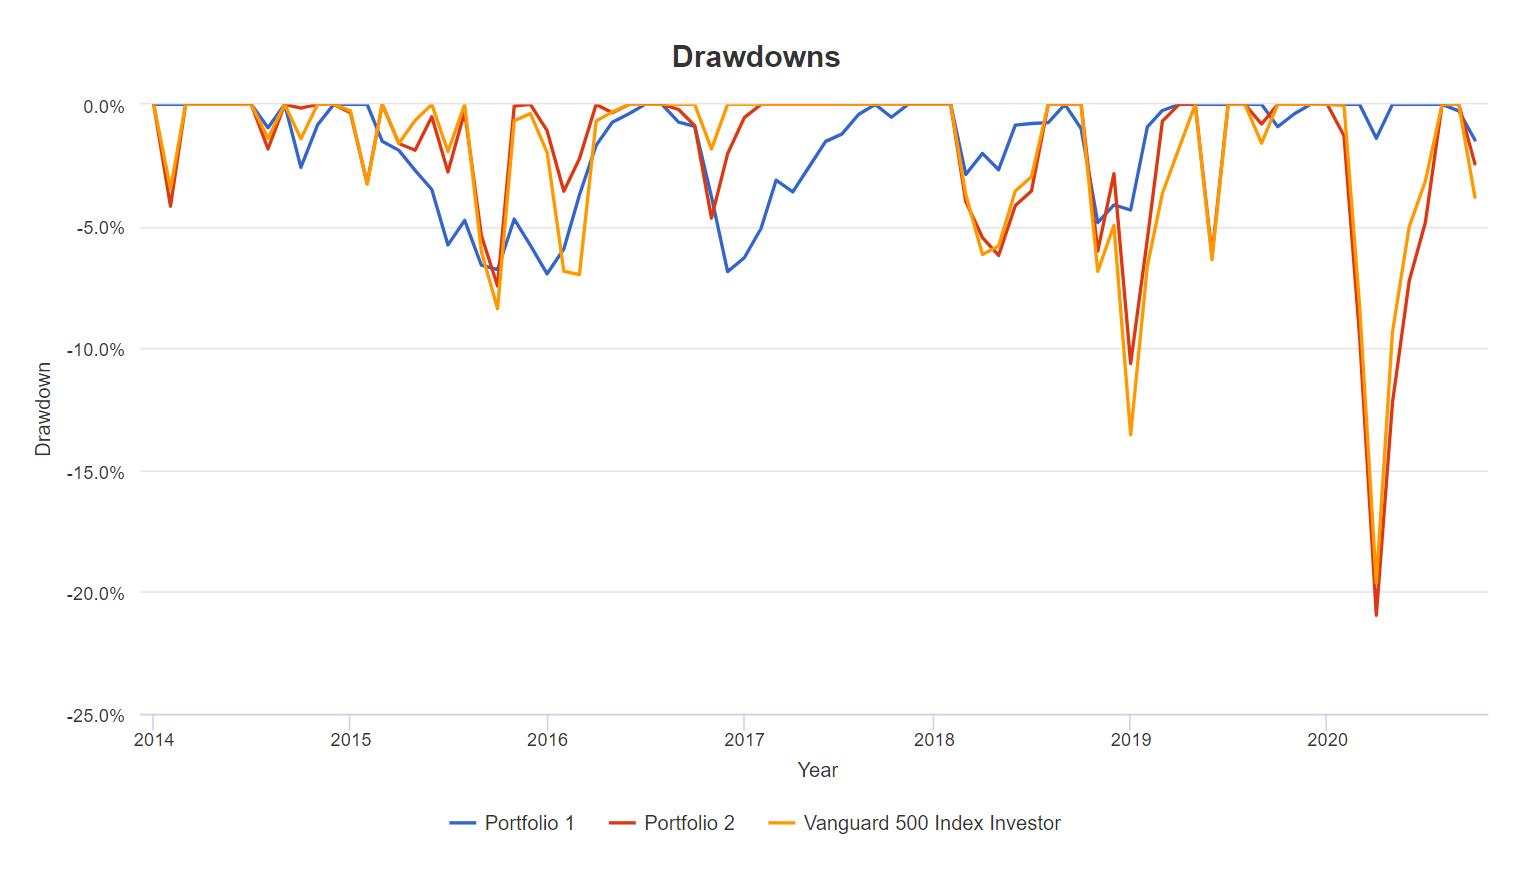 Вкладка Drawdowns, история просадок портфелей